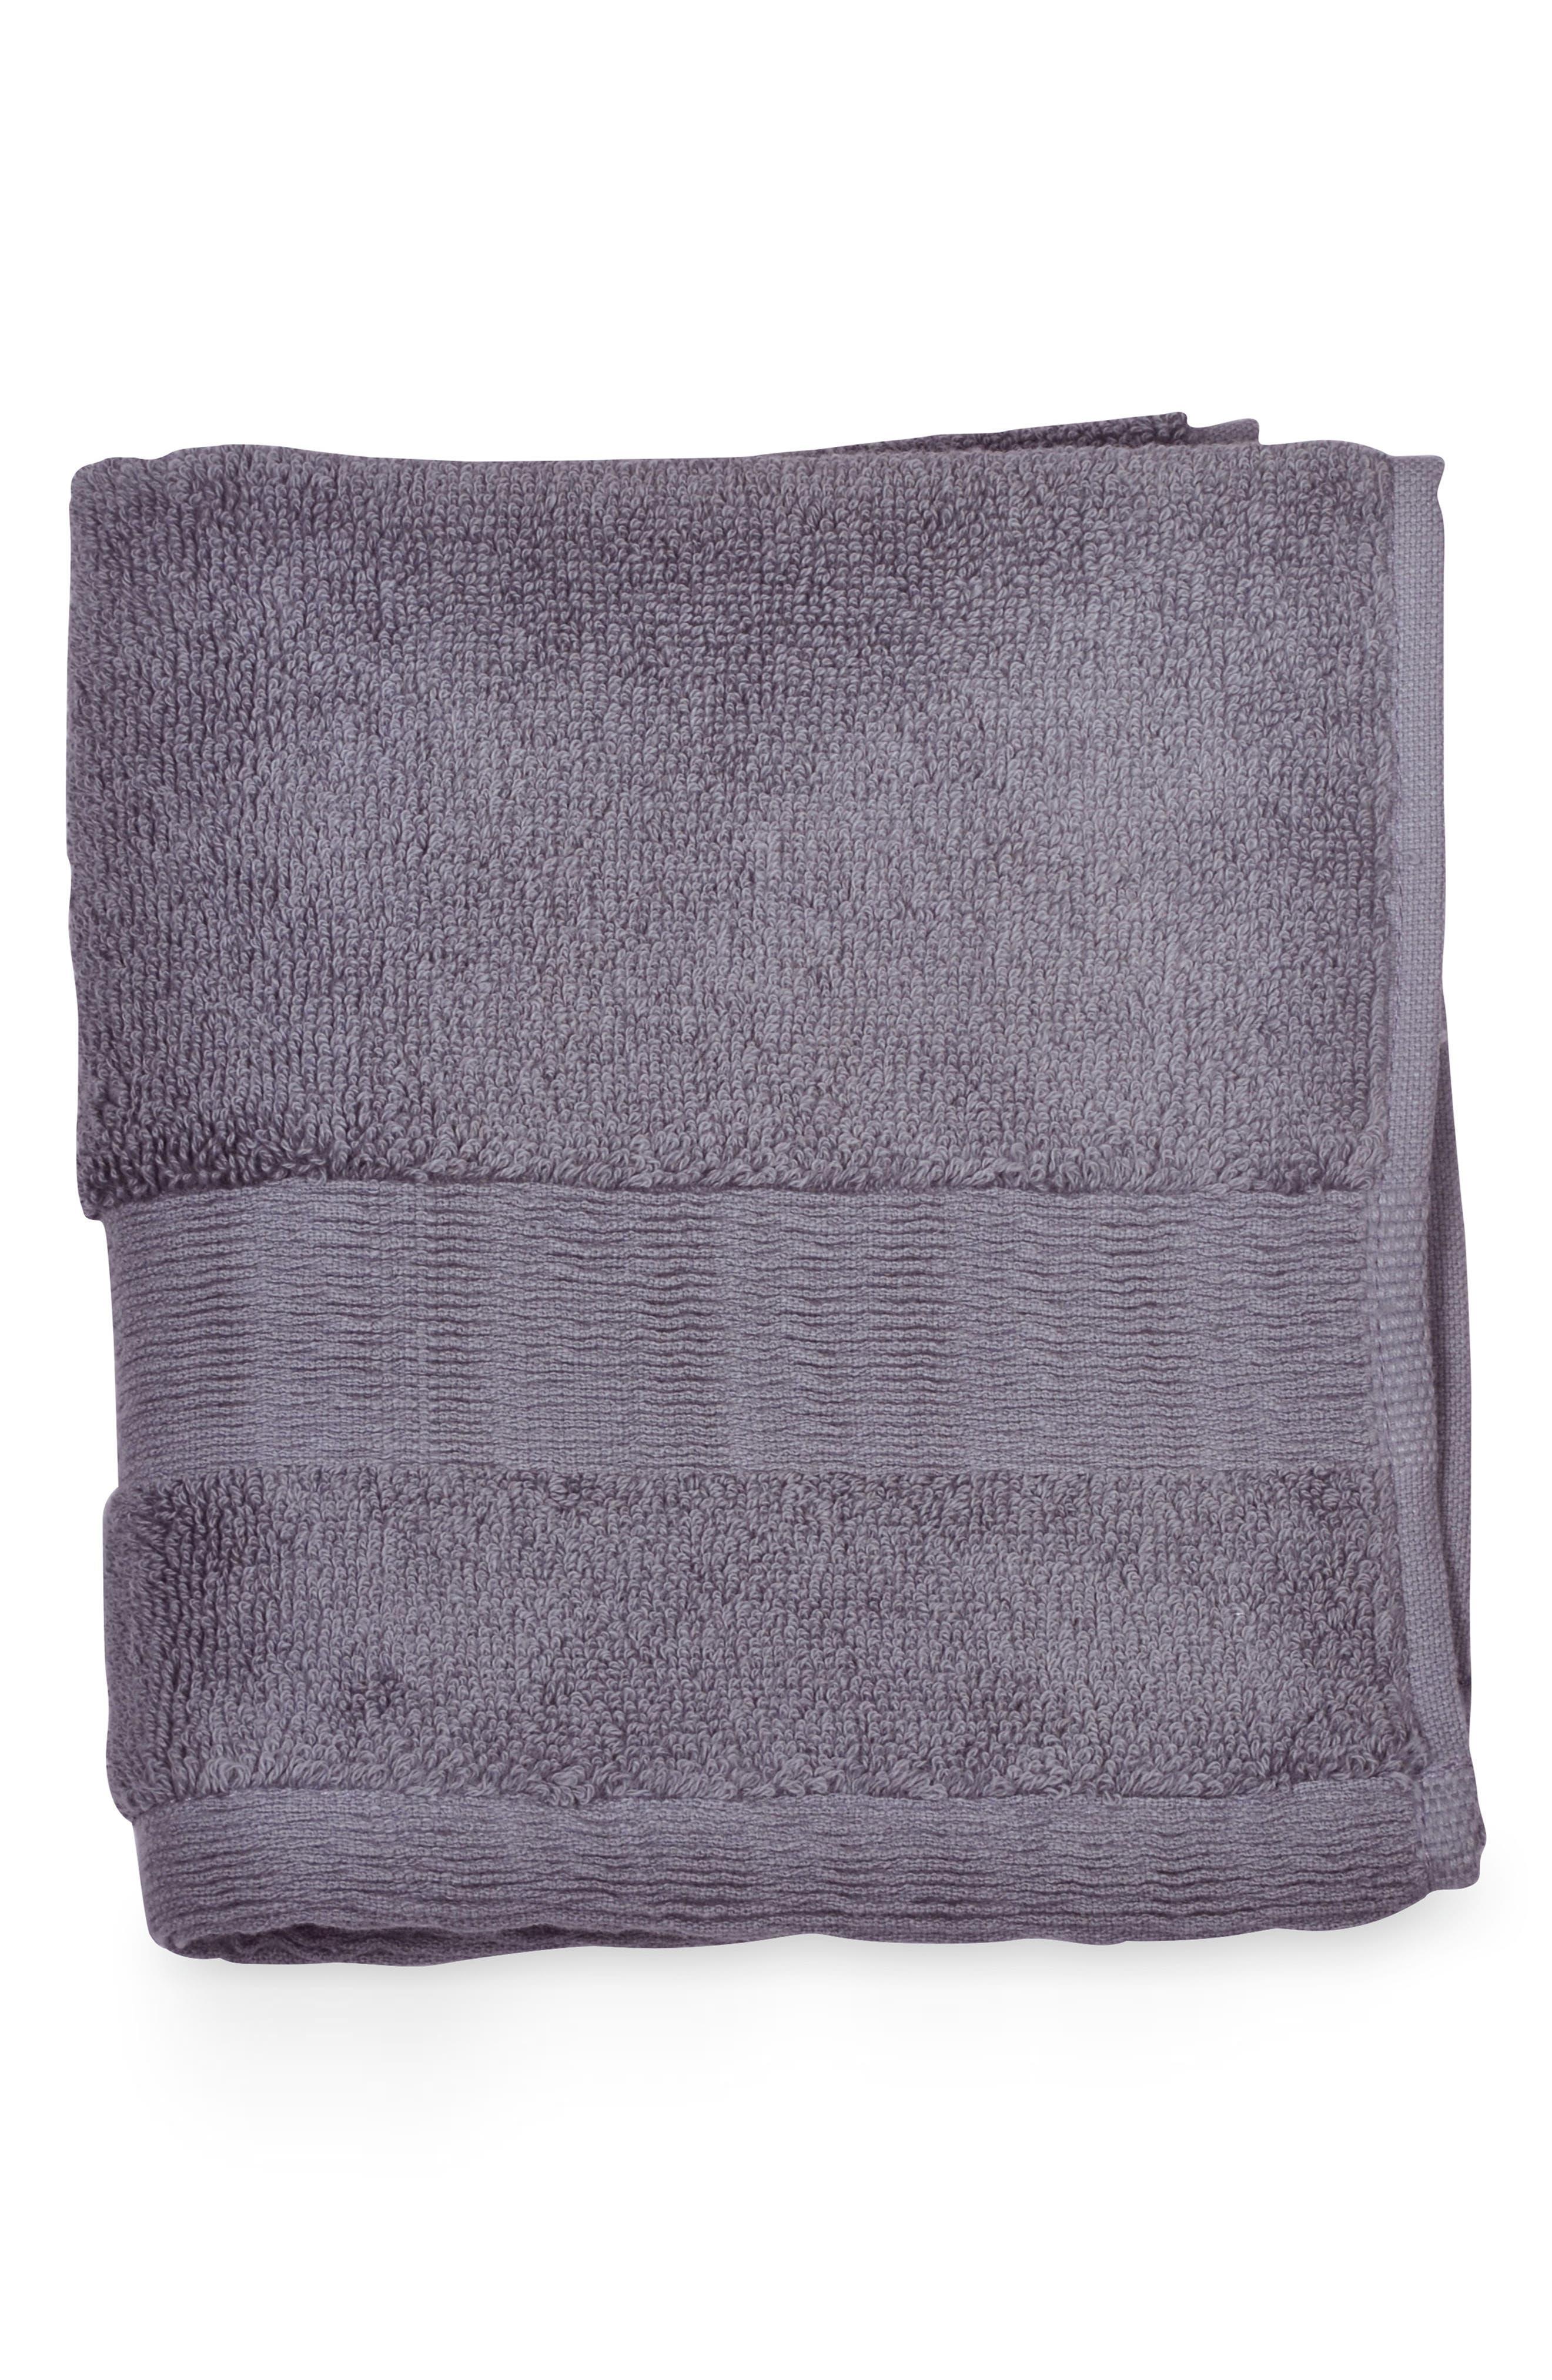 Mercer Washcloth,                             Main thumbnail 1, color,                             Dusty Lavender